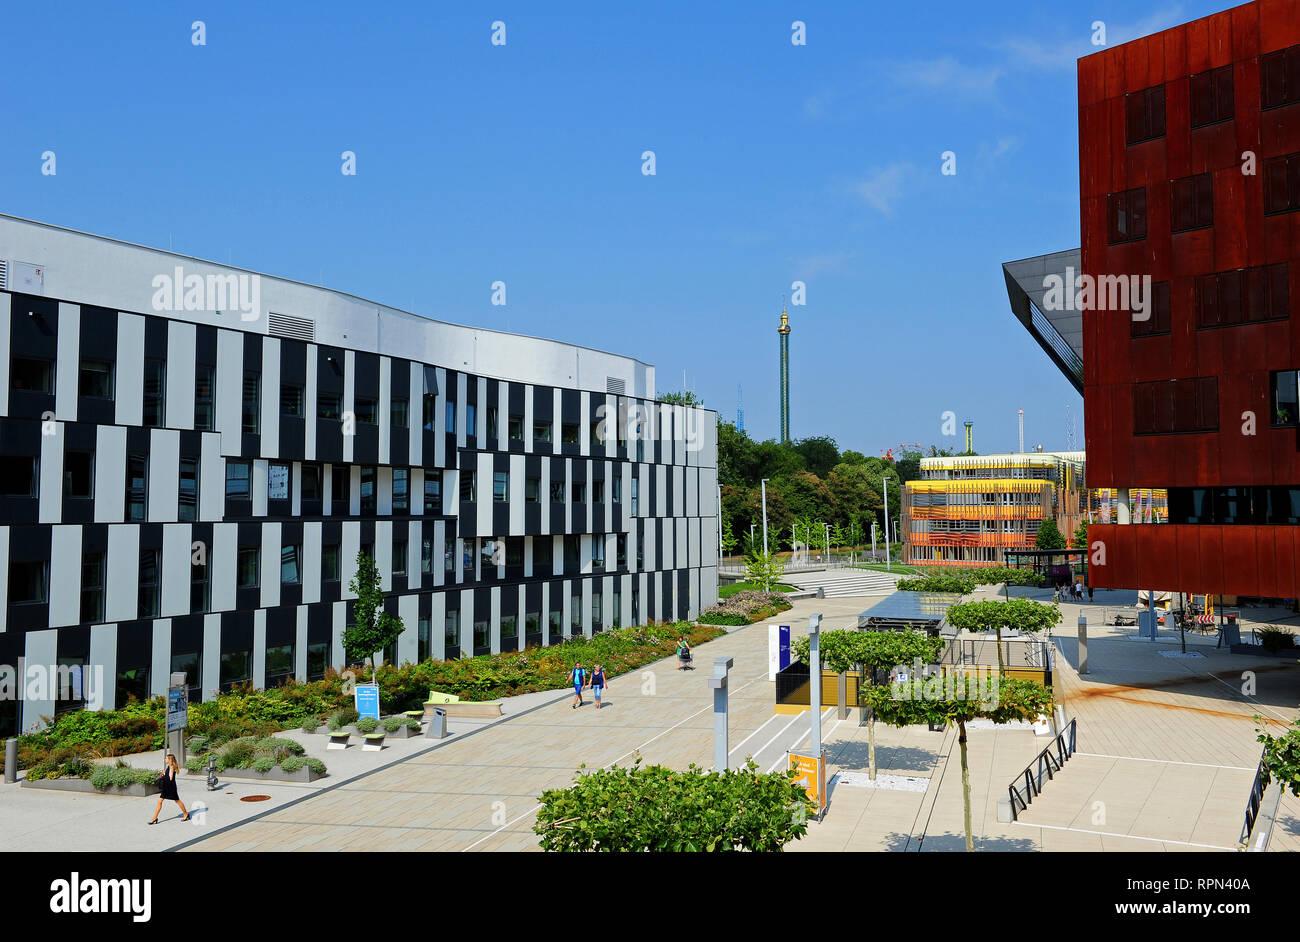 WU campus, University of Economics, Vienna, Austria - Stock Image